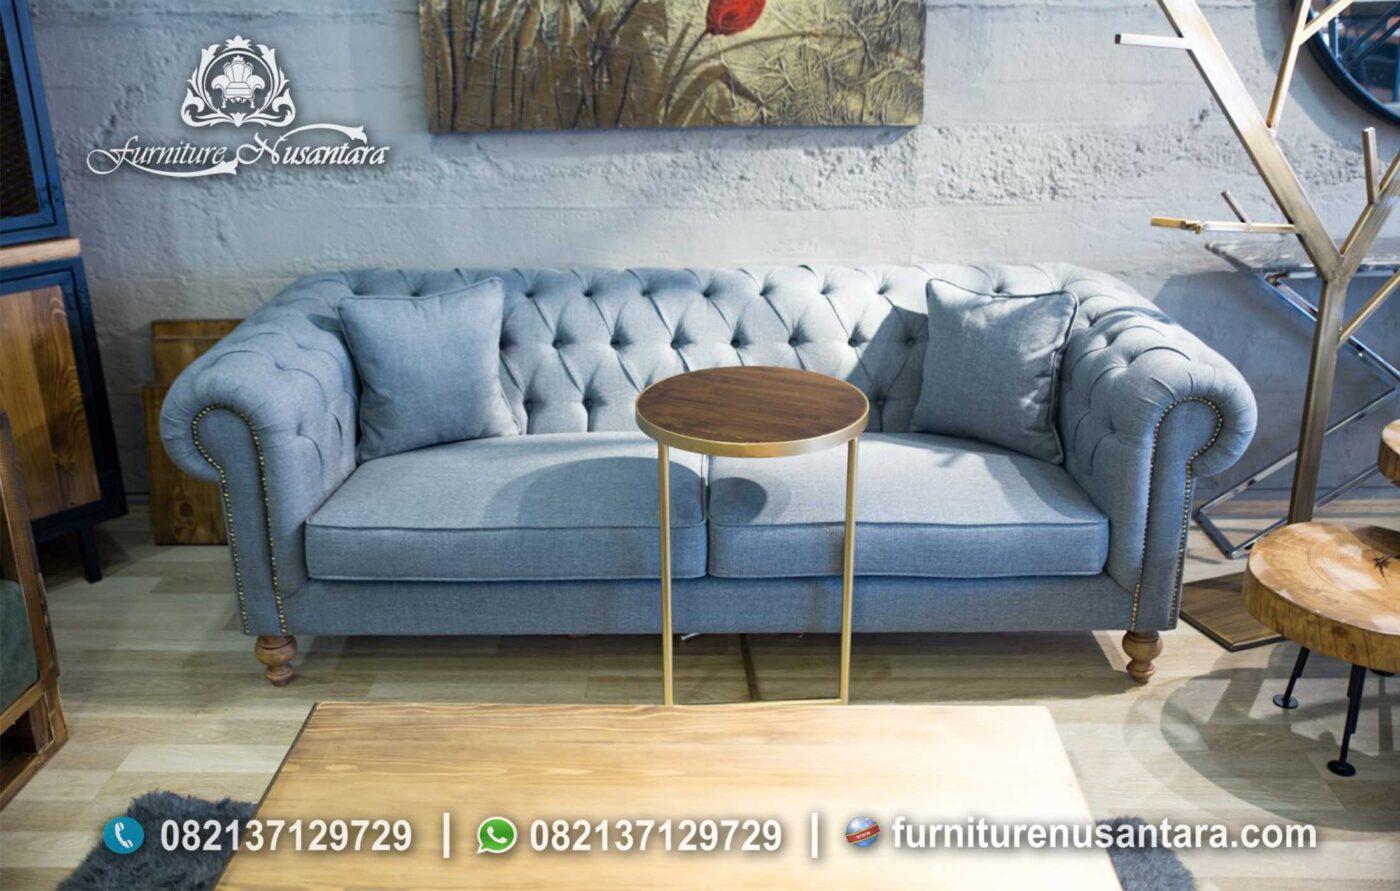 Harga Sofa Minimalis Terupdate ST-81, Furniture Nusantara